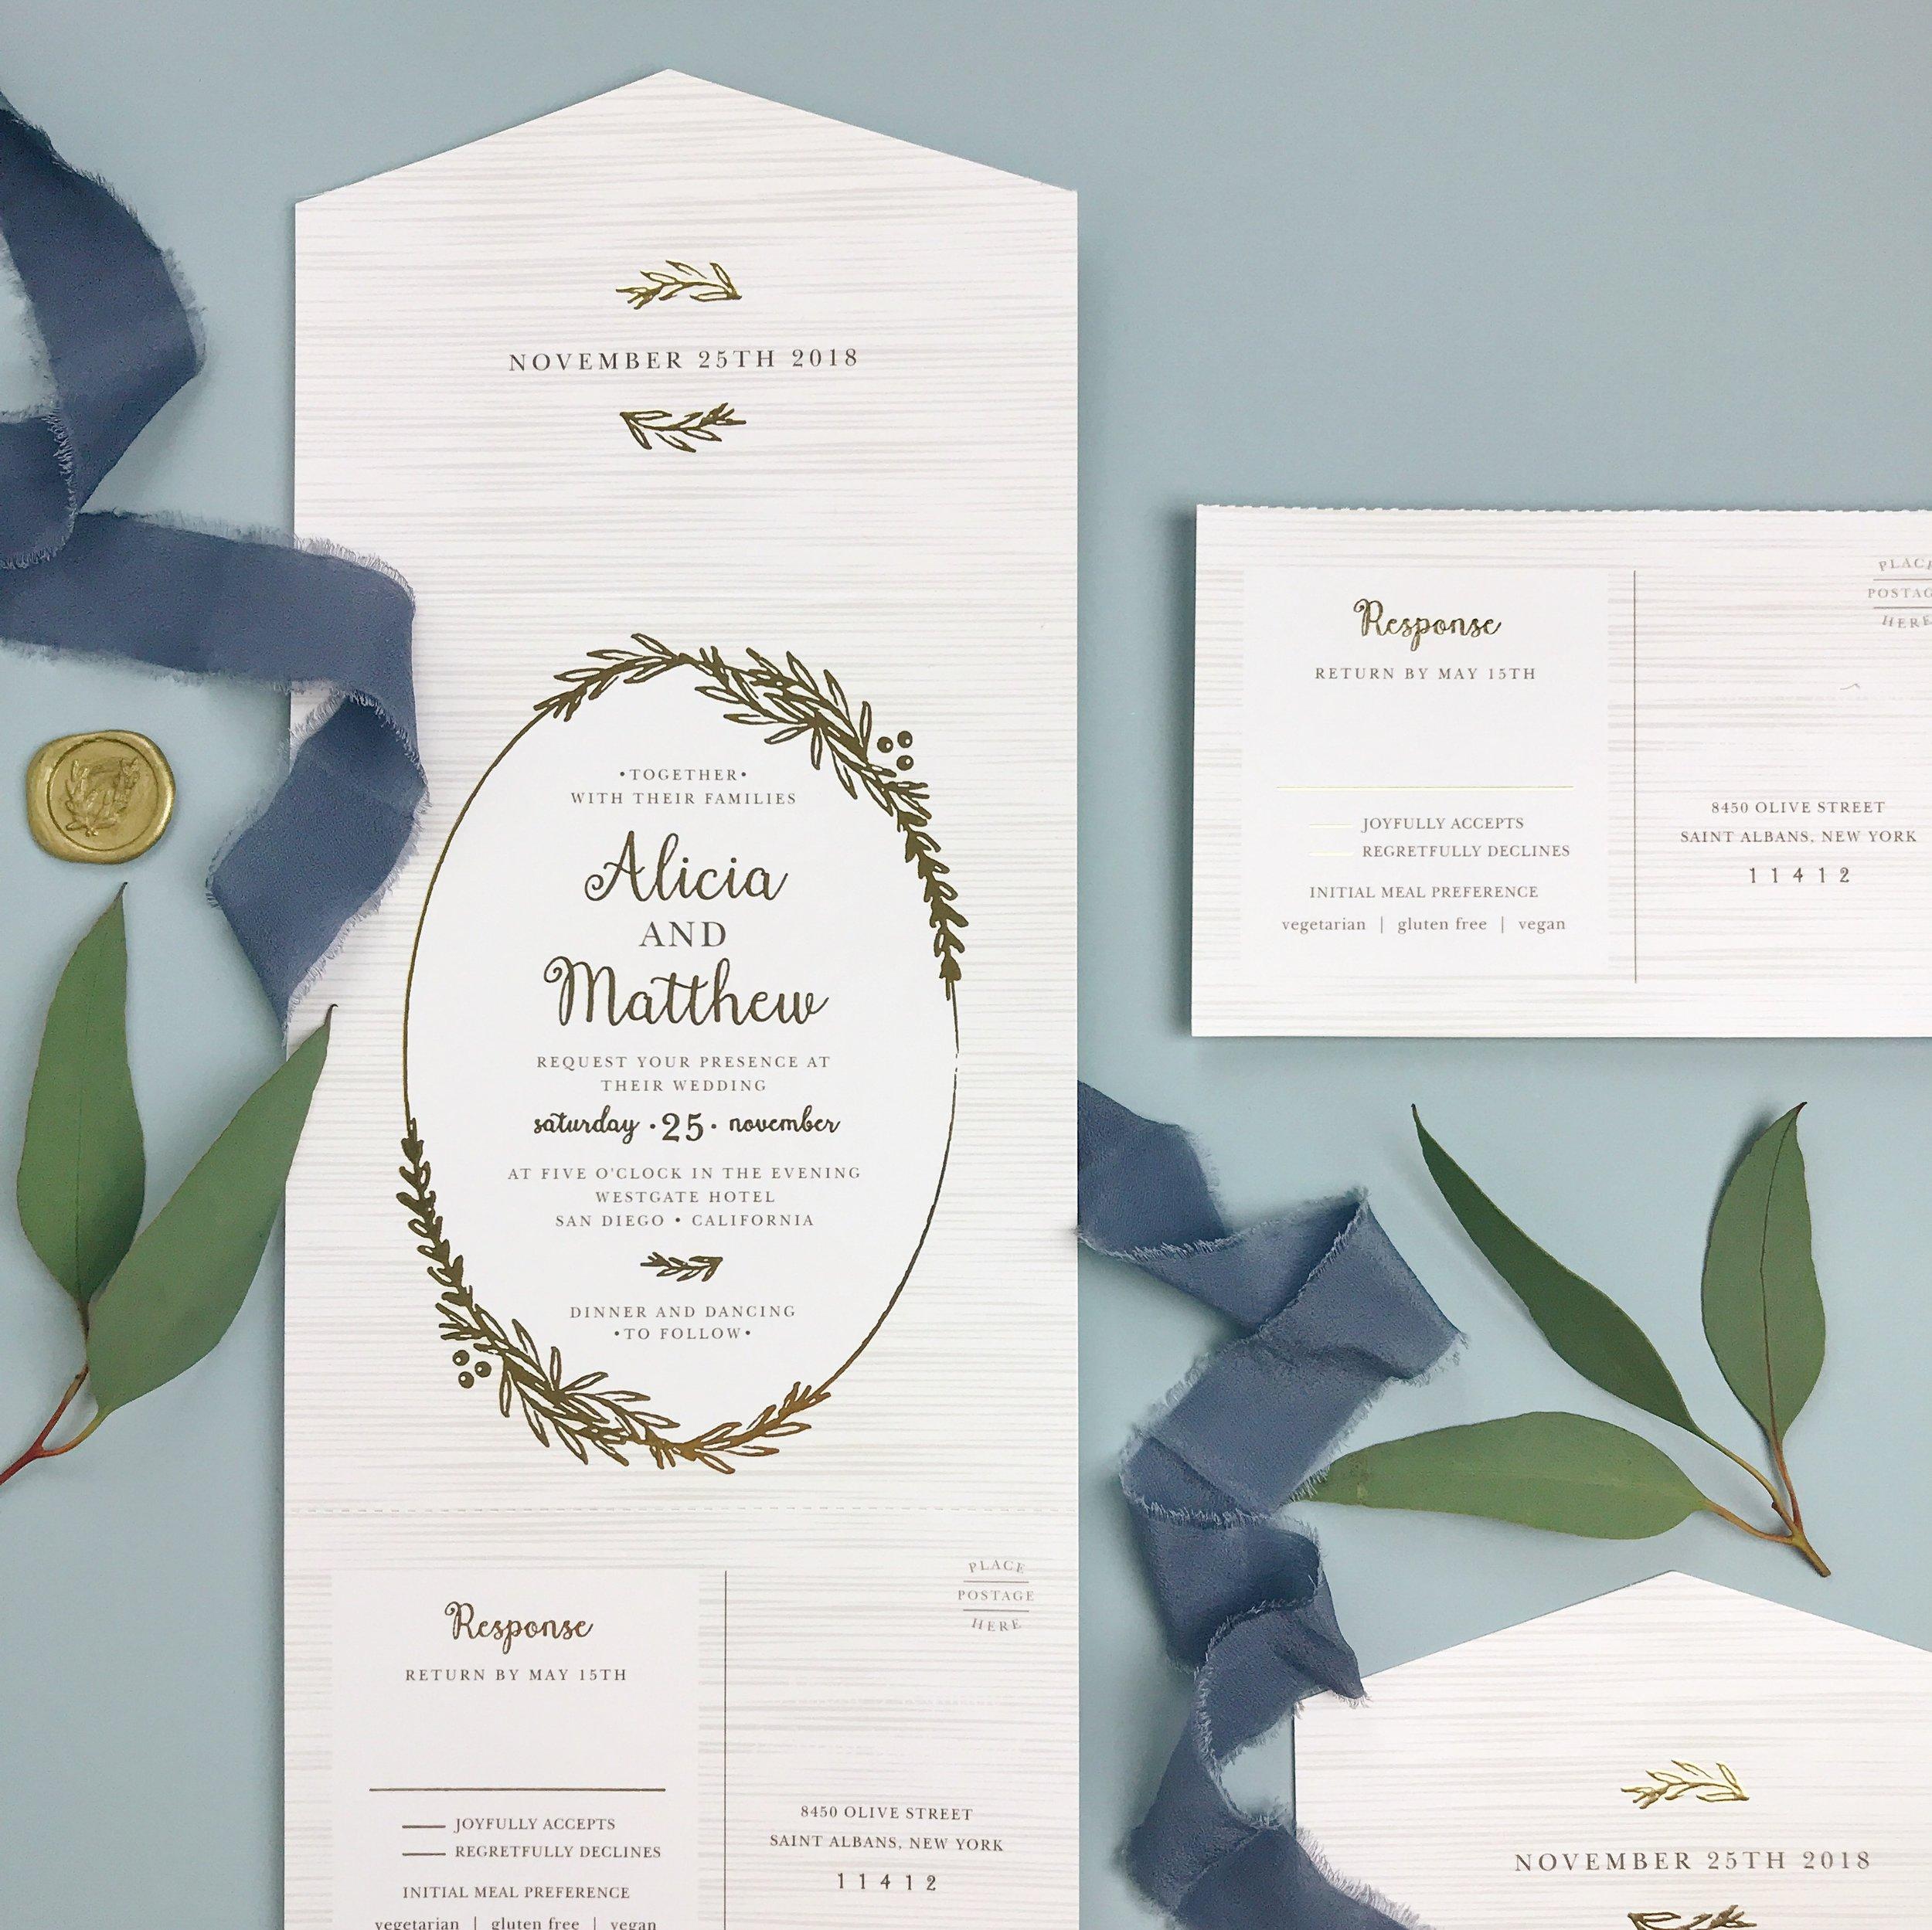 Basic_Invite_Fall_Winter_Wedding_13 copy.jpg